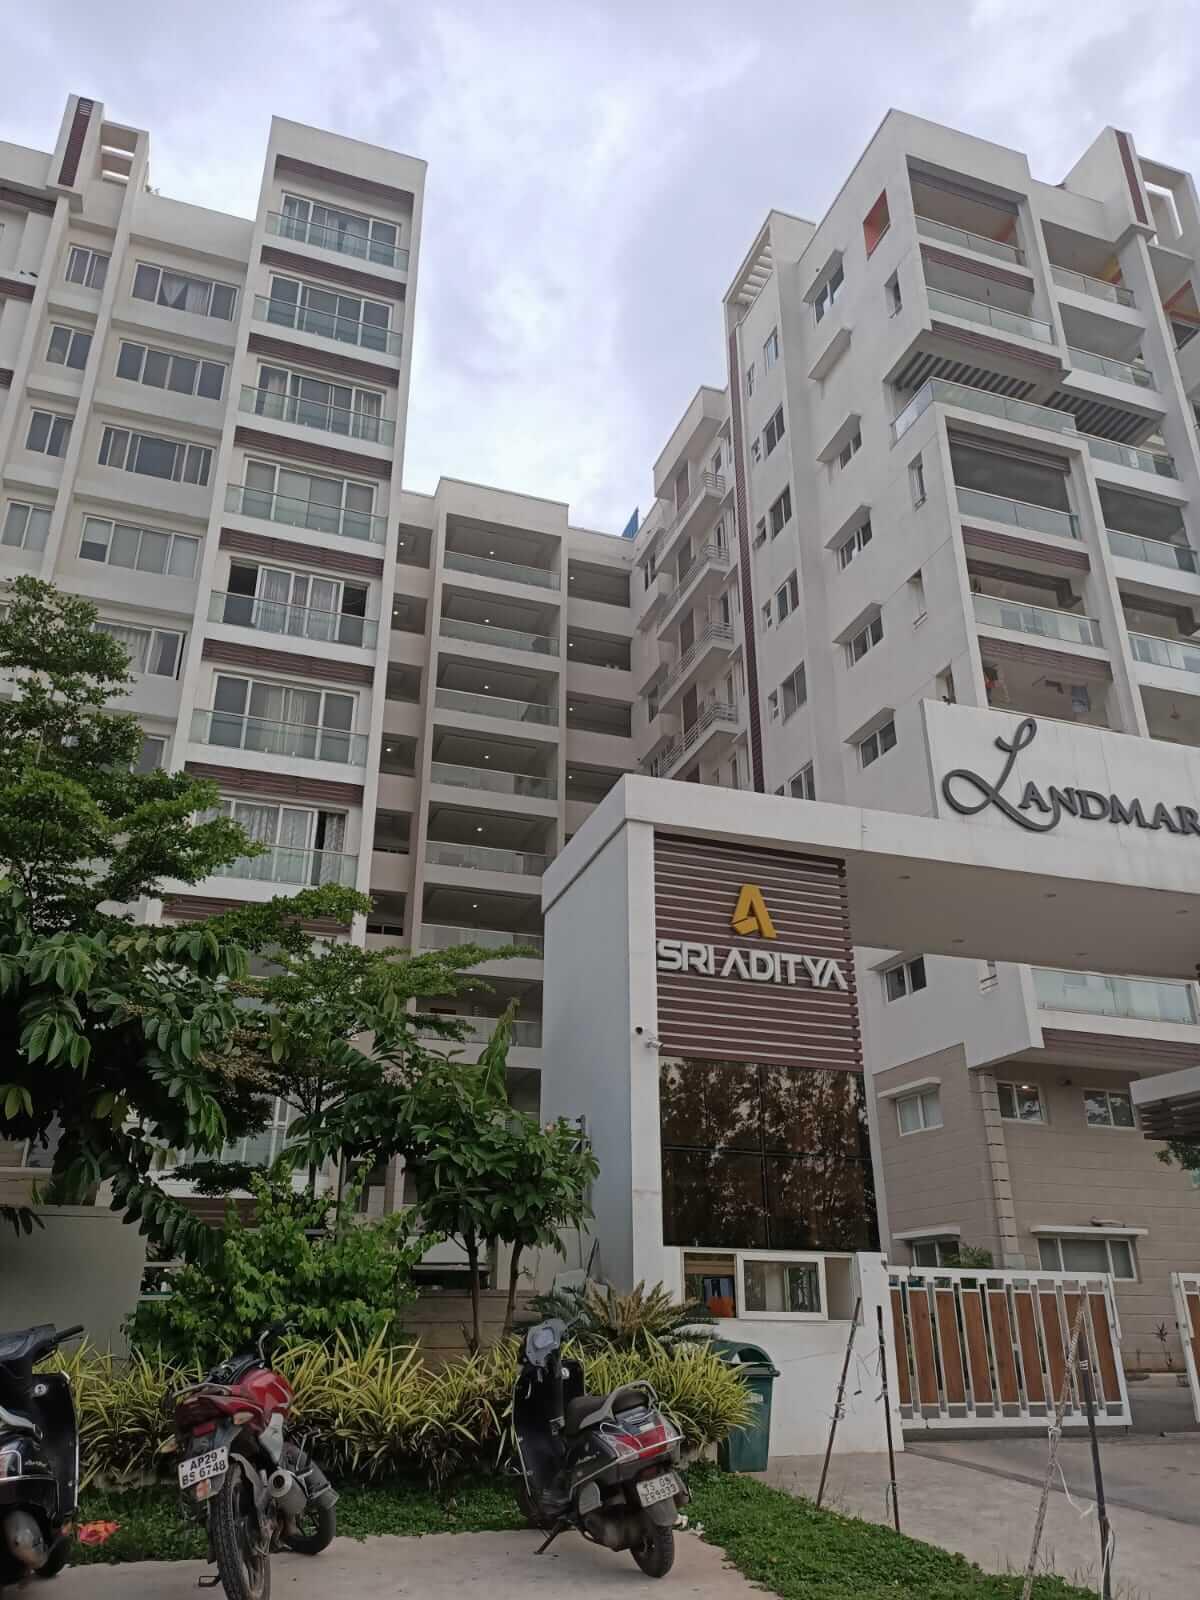 4 BHK Apartment / Flat for Rent 4500 Sq. Feet at Hyderabad, Somajiguda